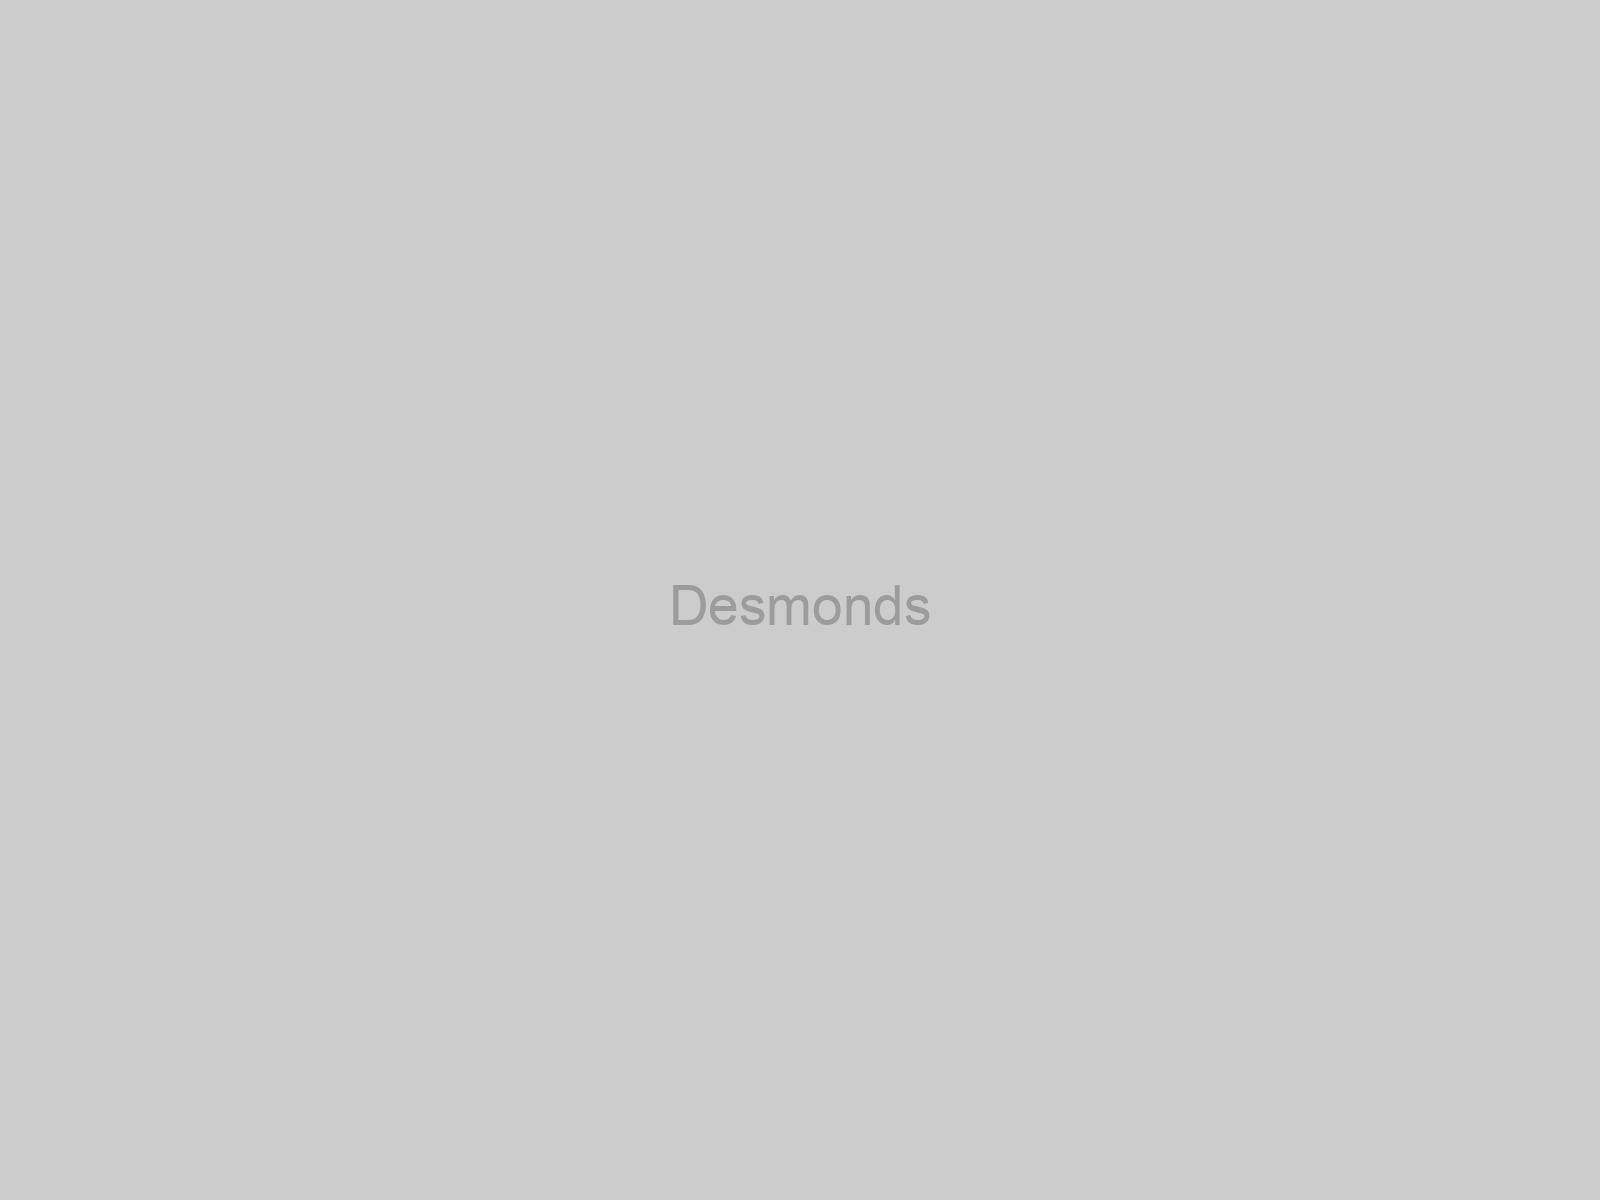 Desmonds